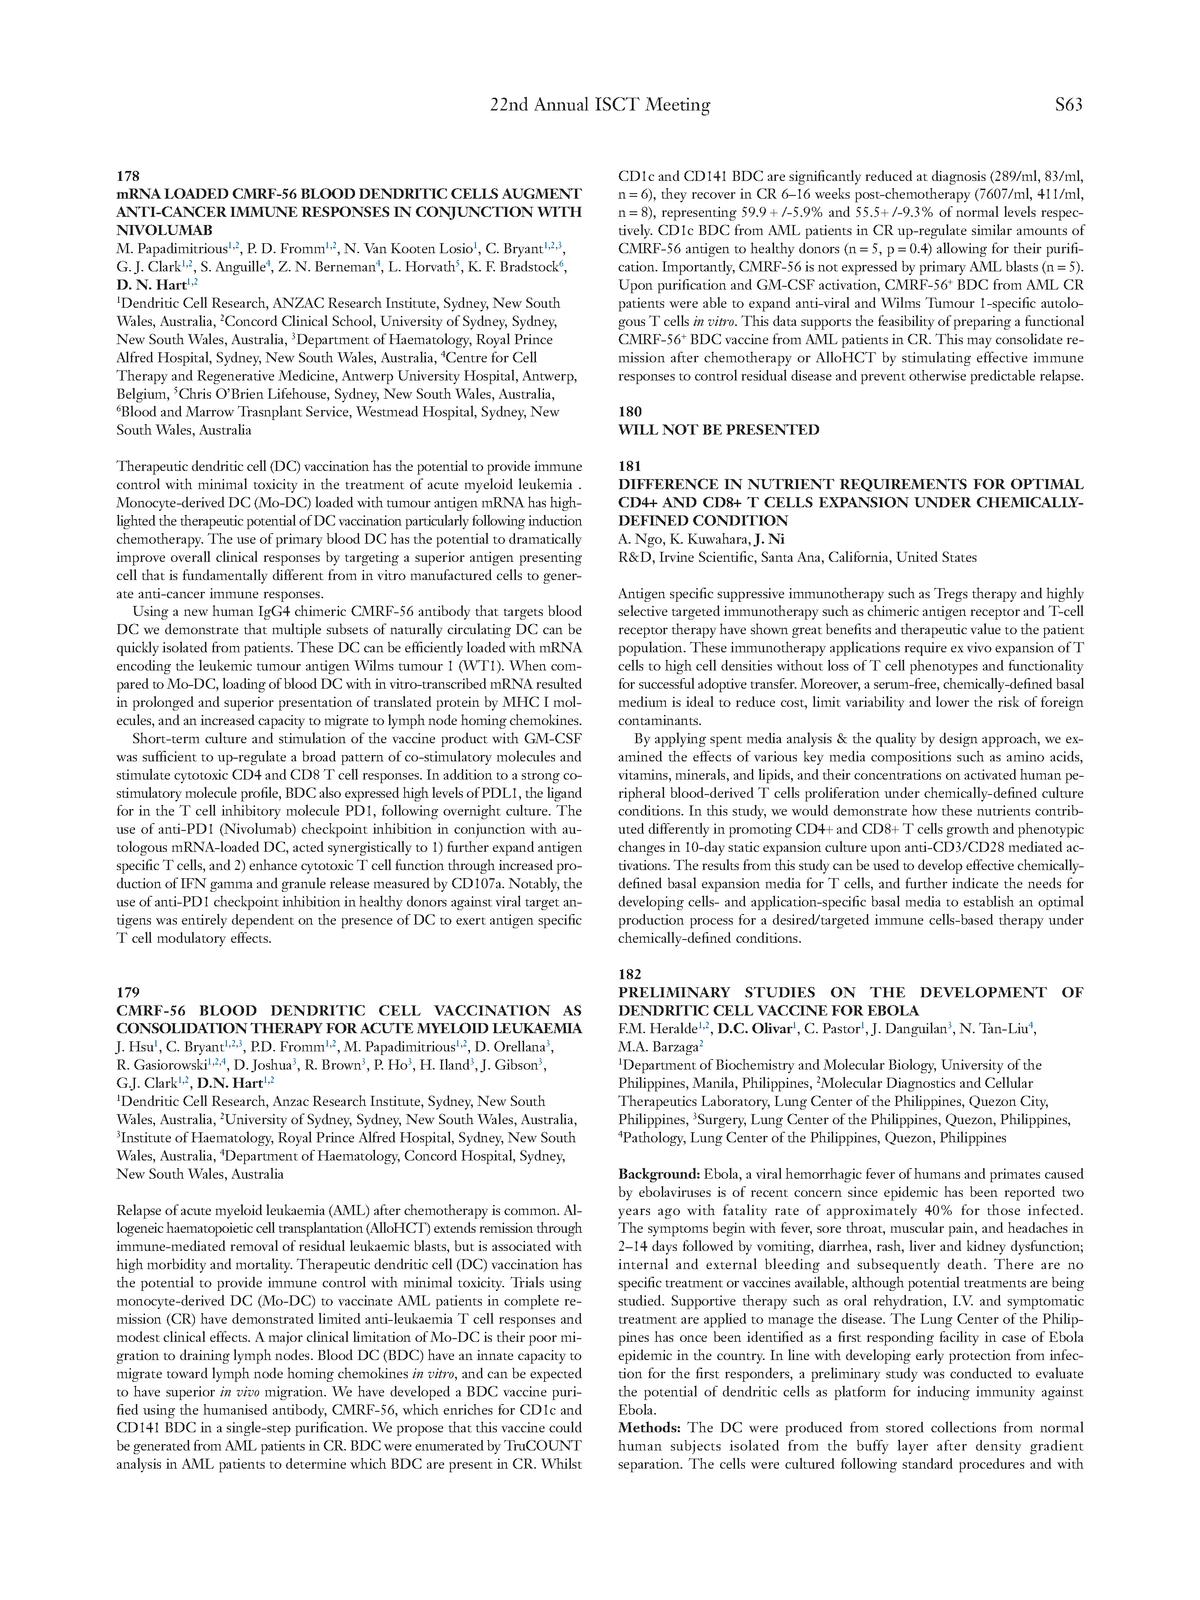 1-s2 0-S146532491630233X-main - Genòmica Humana - StuDocu